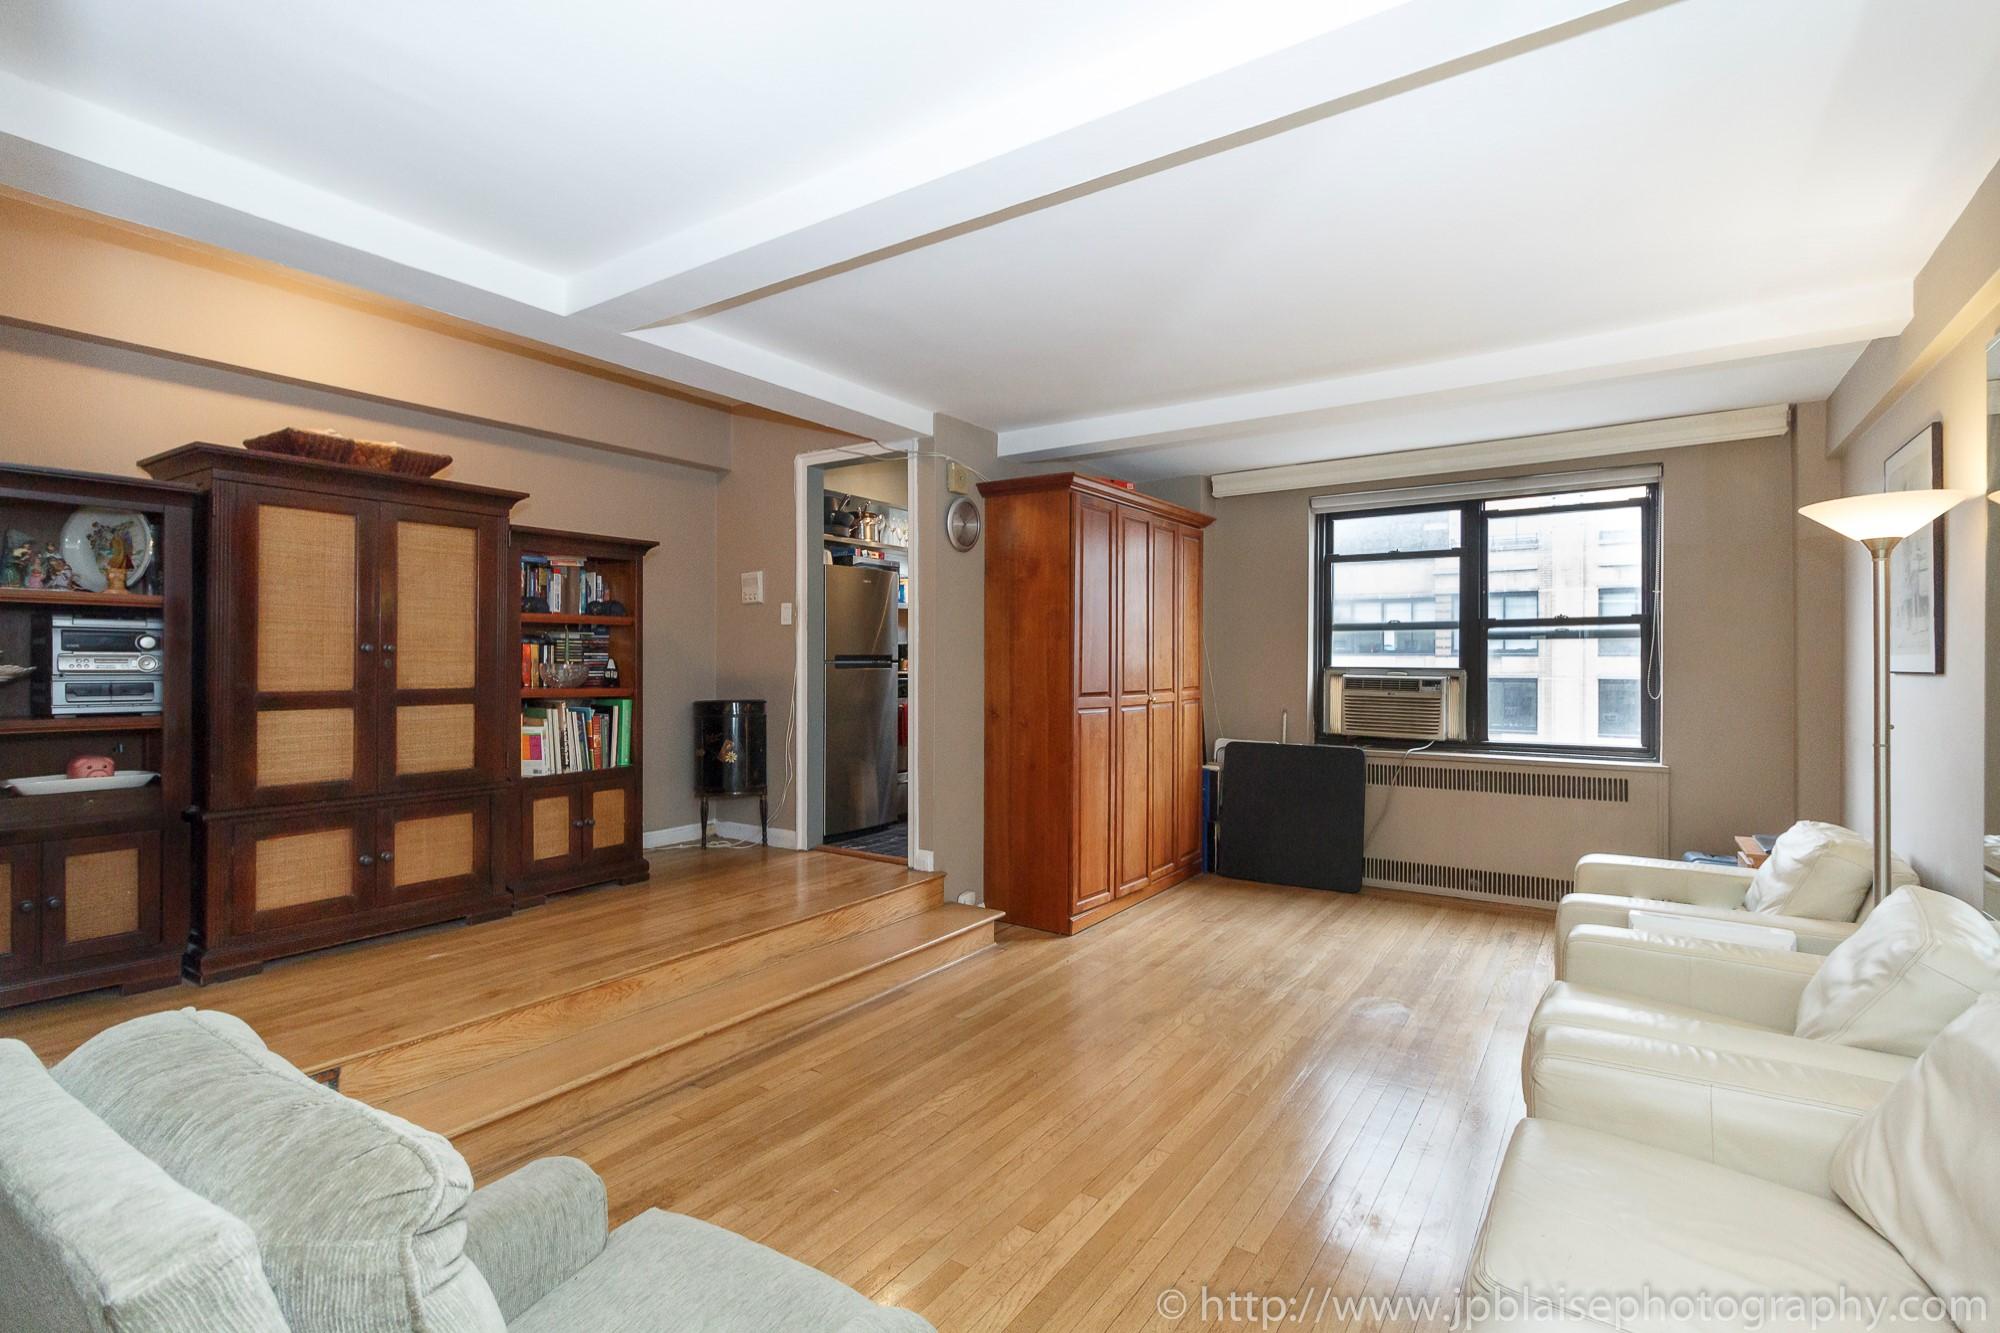 New york apartment photographer - Recent work: alcove studio in the